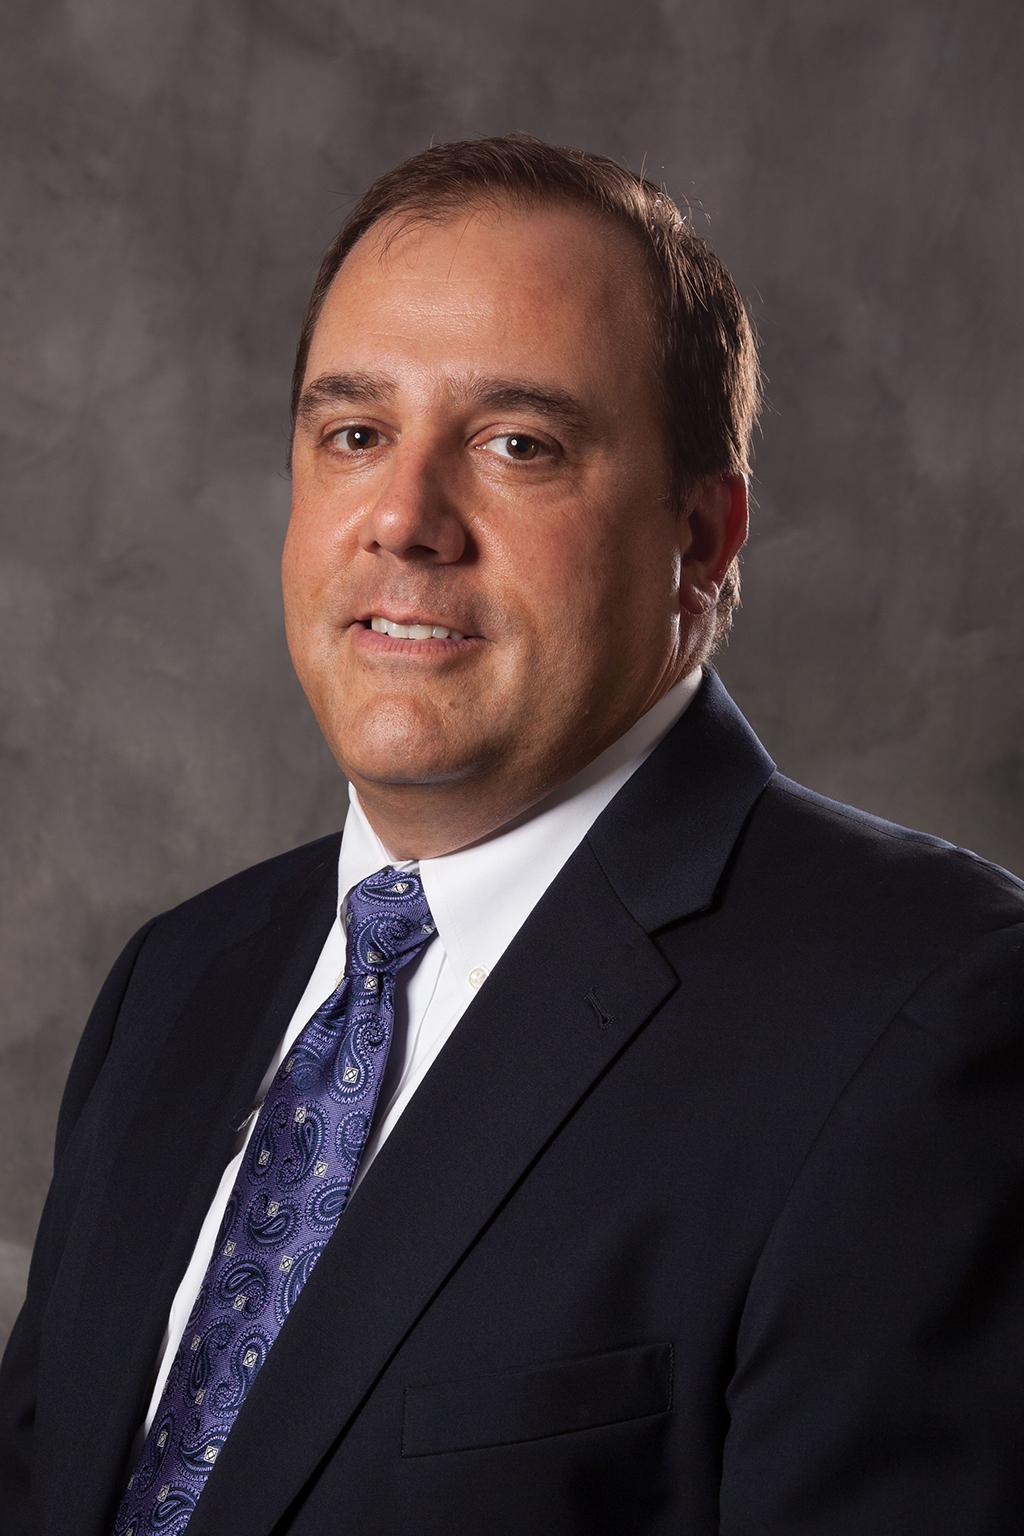 Portraitbild Mark Humrichouser, Vice President of Global Sales bei Shure